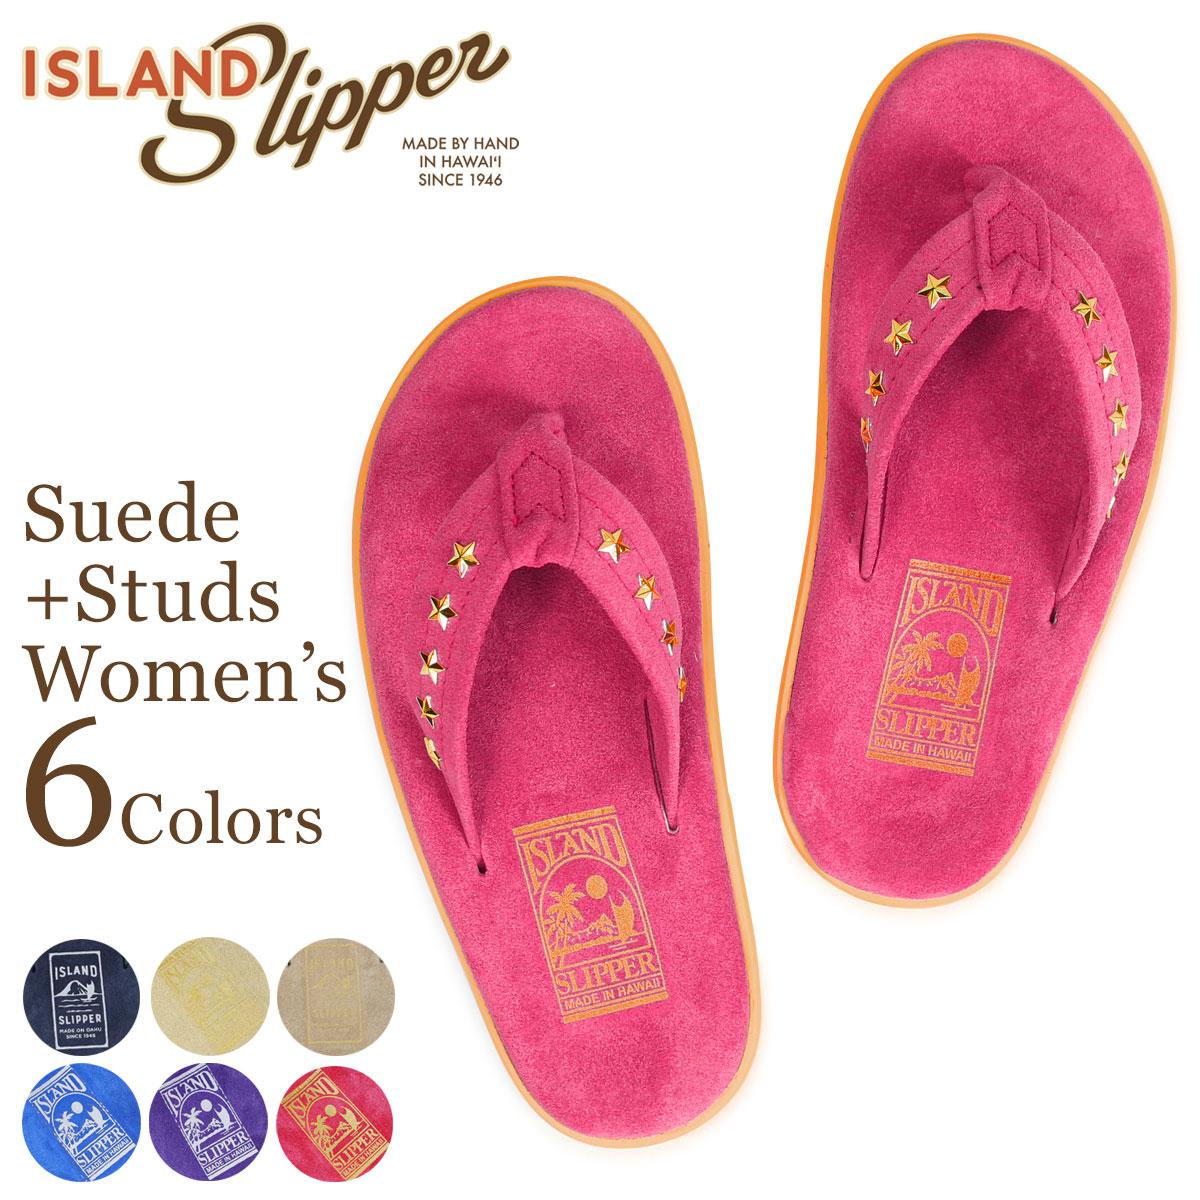 ISLAND SLIPPER SUEDE STUDS アイランドスリッパ サンダル トングサンダル レディース スエード スタッズ PT203 STD18 [4/5 追加入荷]